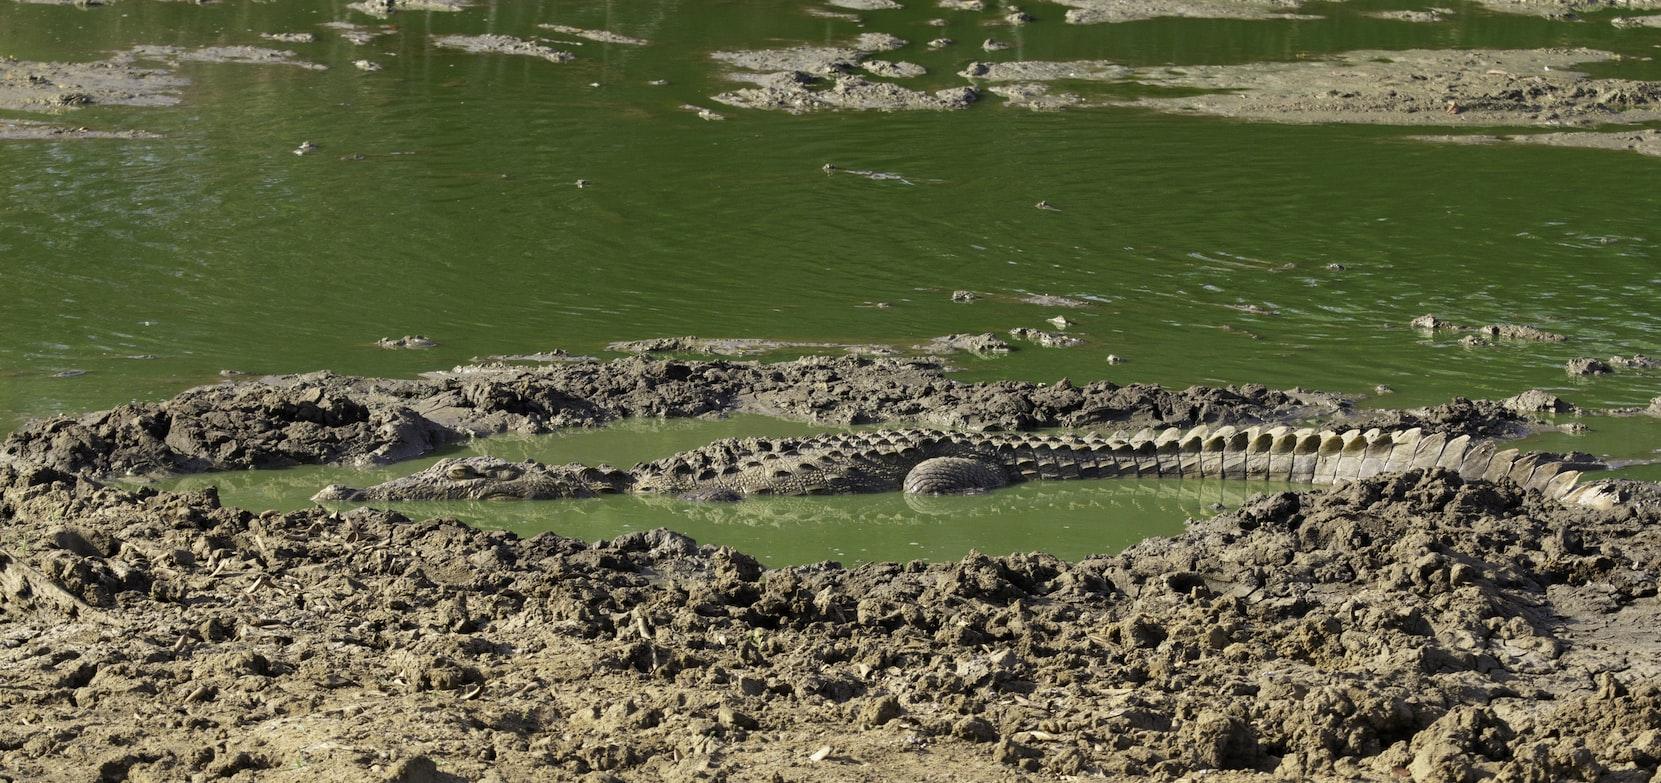 Crocodile - Yala national park